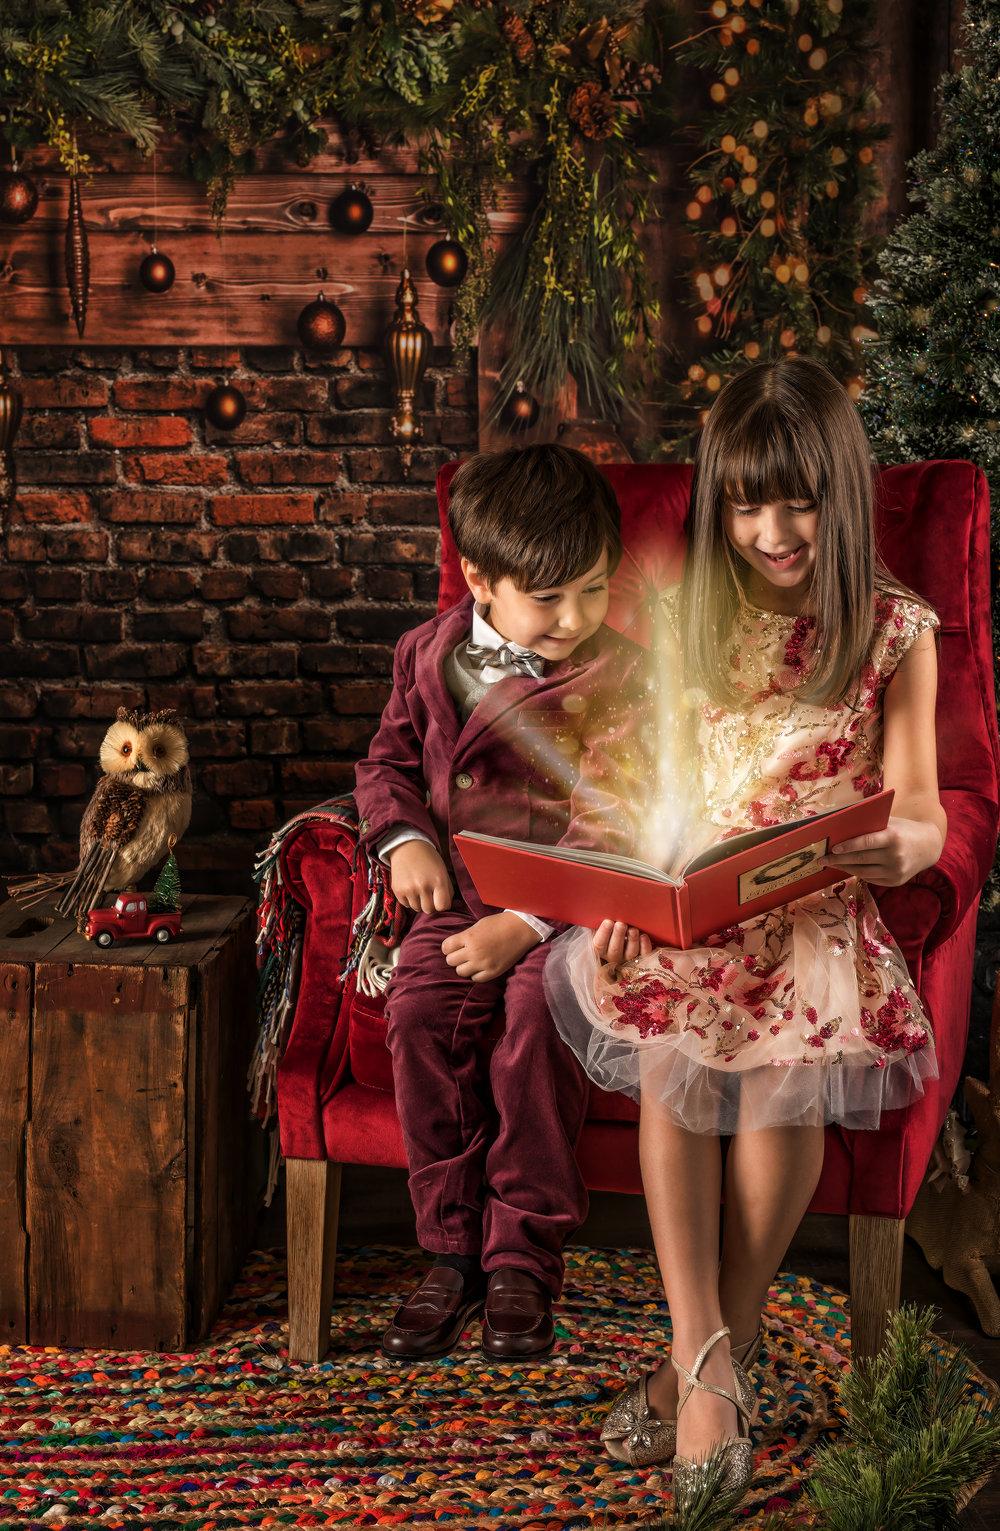 fusco holiday 2018 (13 of 33)magic.jpg